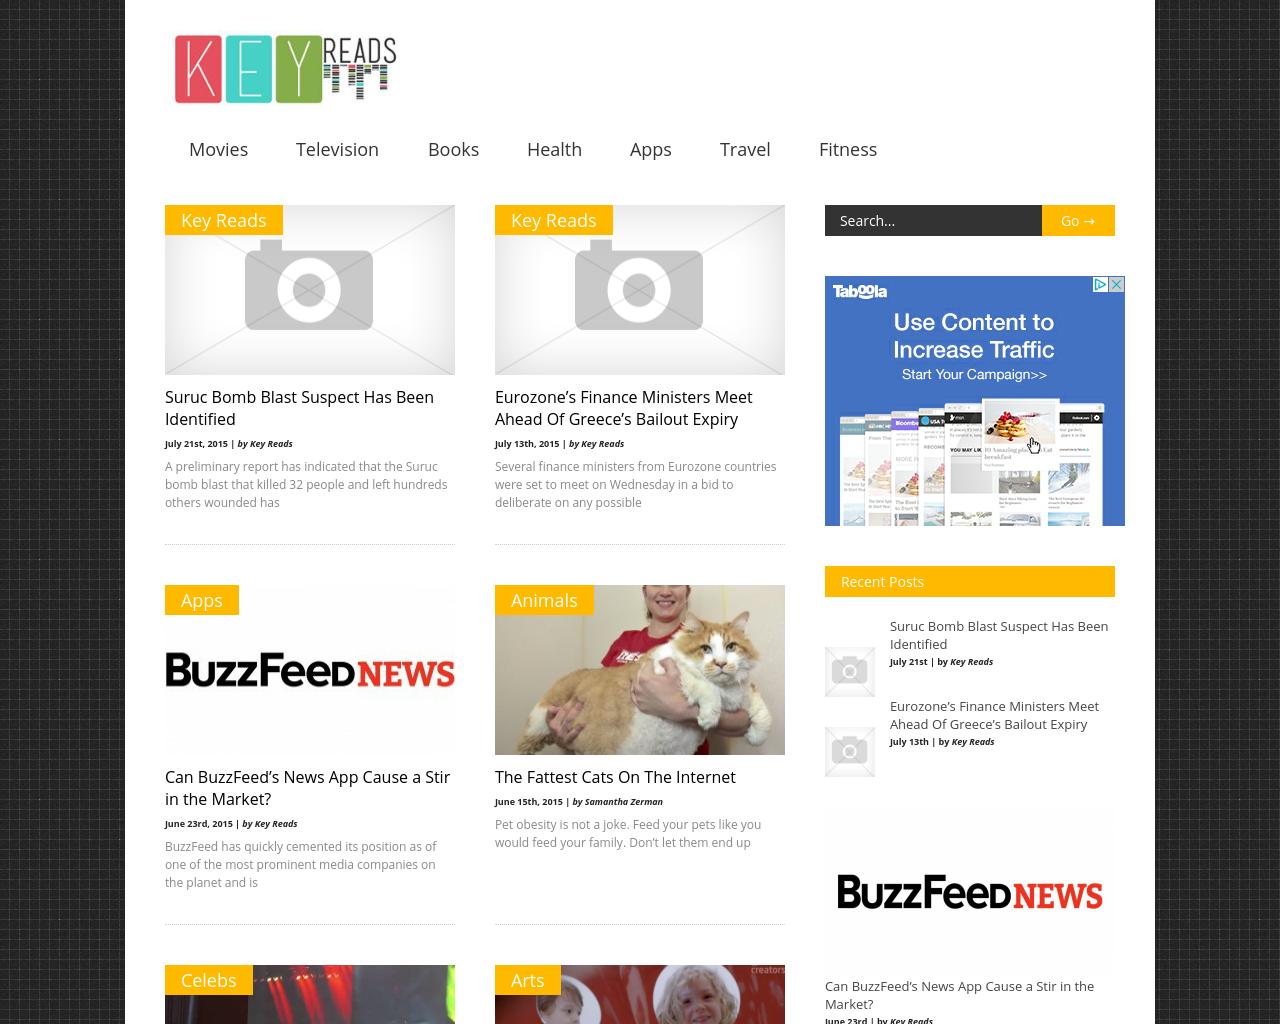 Key-Reads-Digital-Media-Network-Advertising-Reviews-Pricing